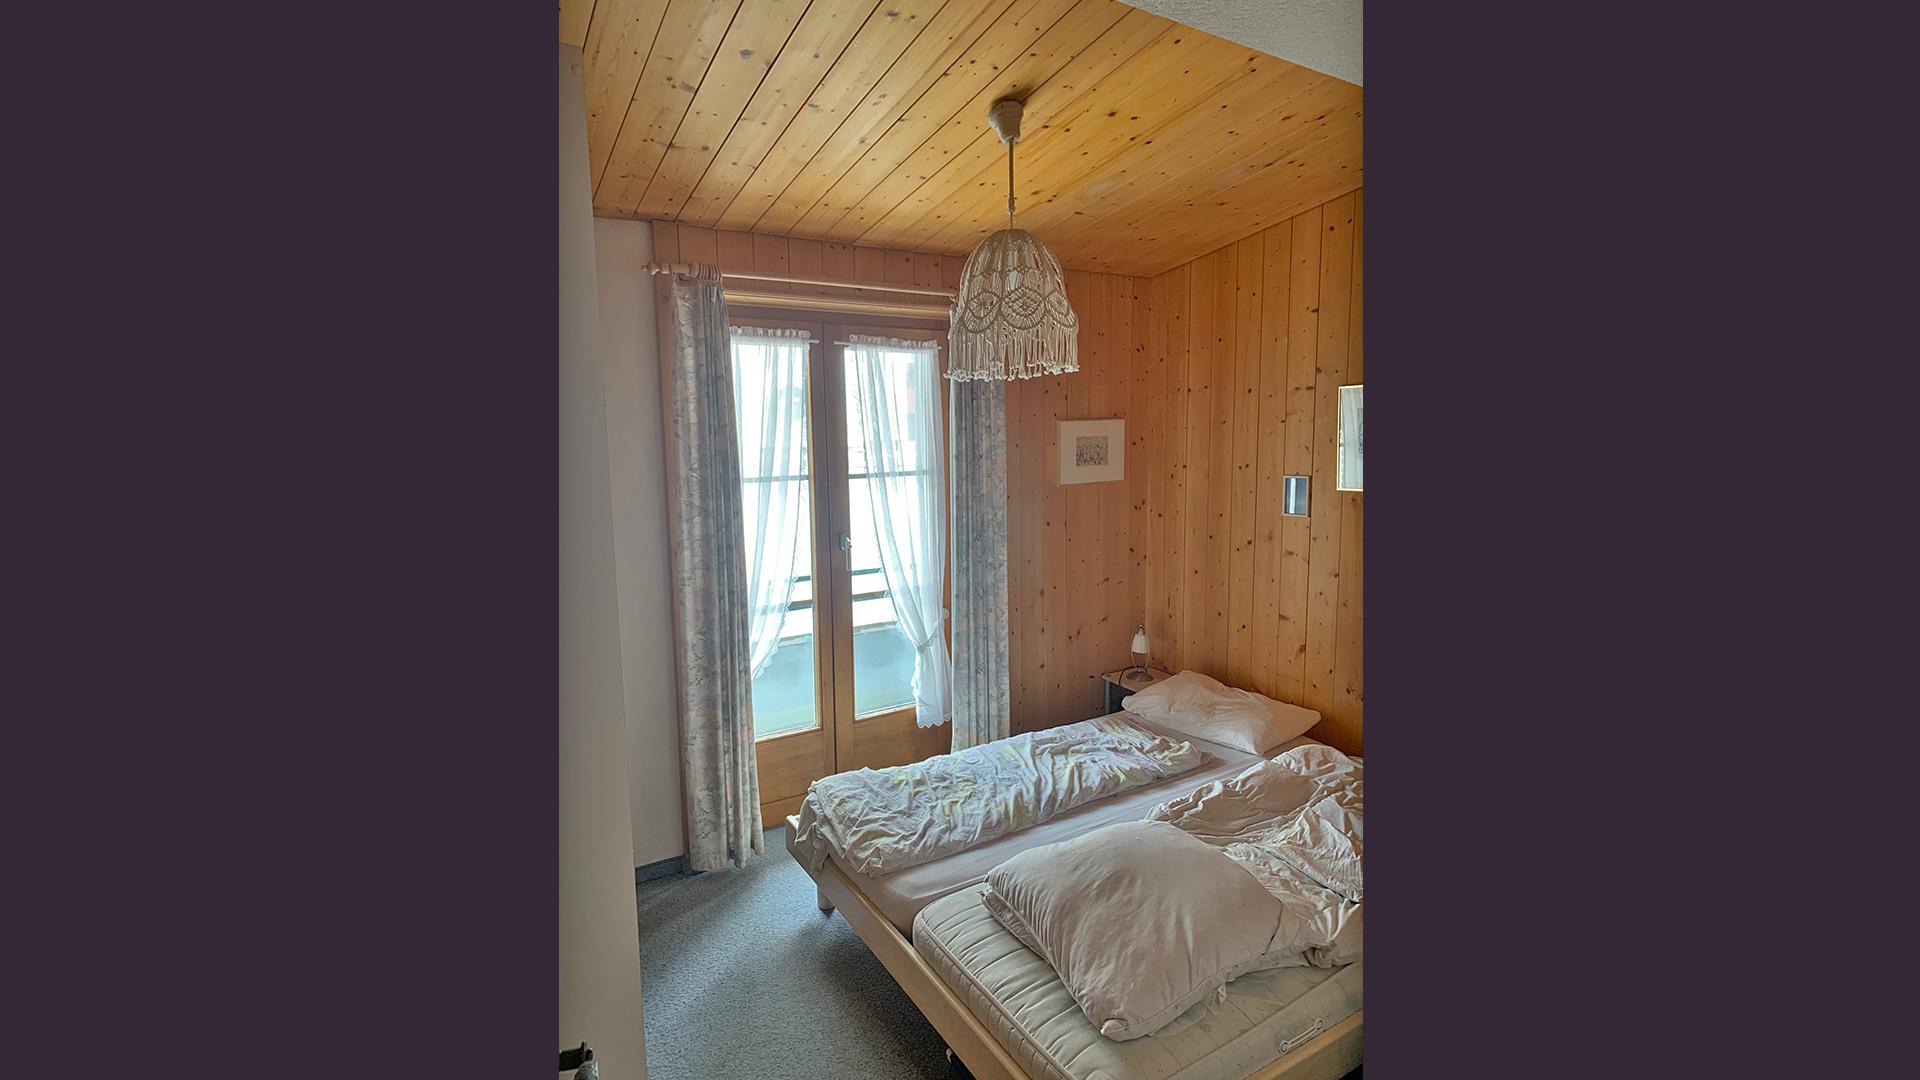 Christiania Apartments, Switzerland